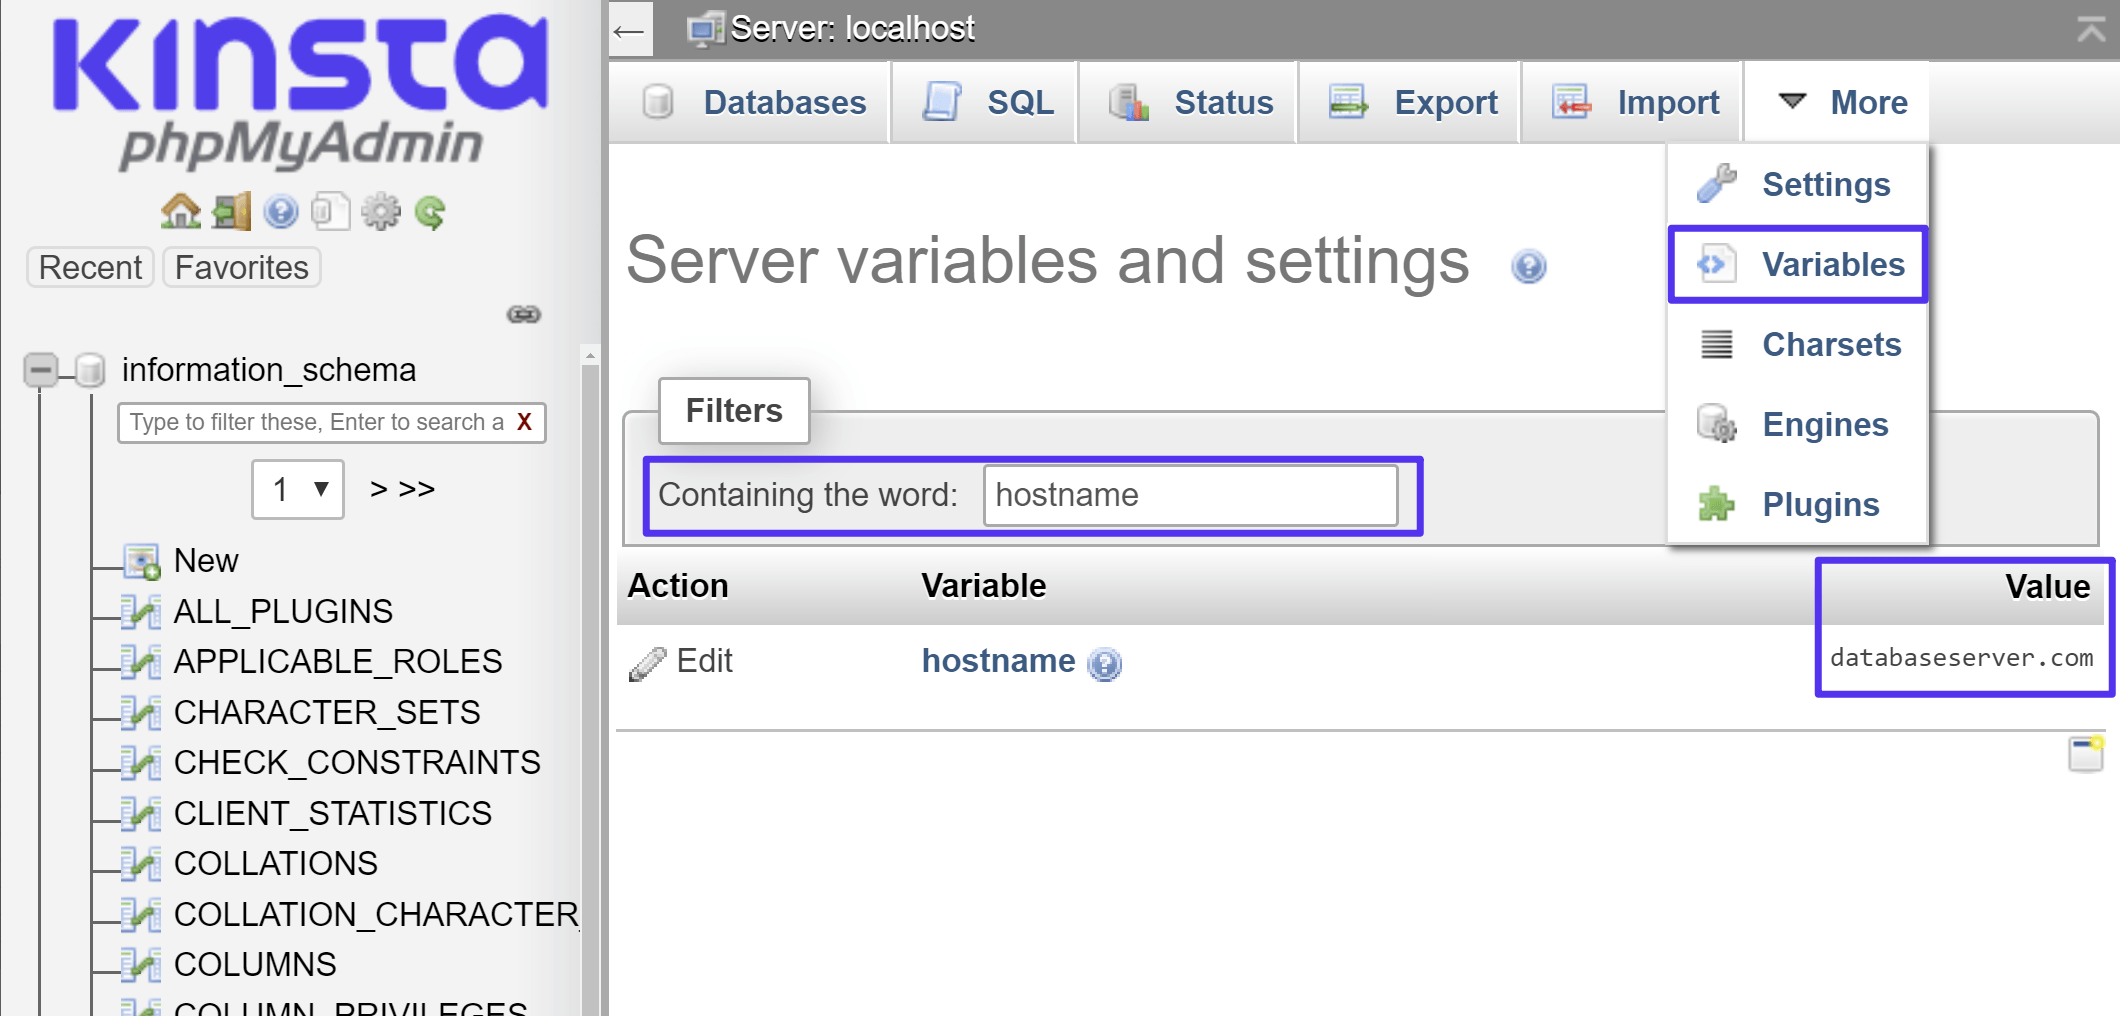 Como encontrar a variável hostname no phpMyAdmin